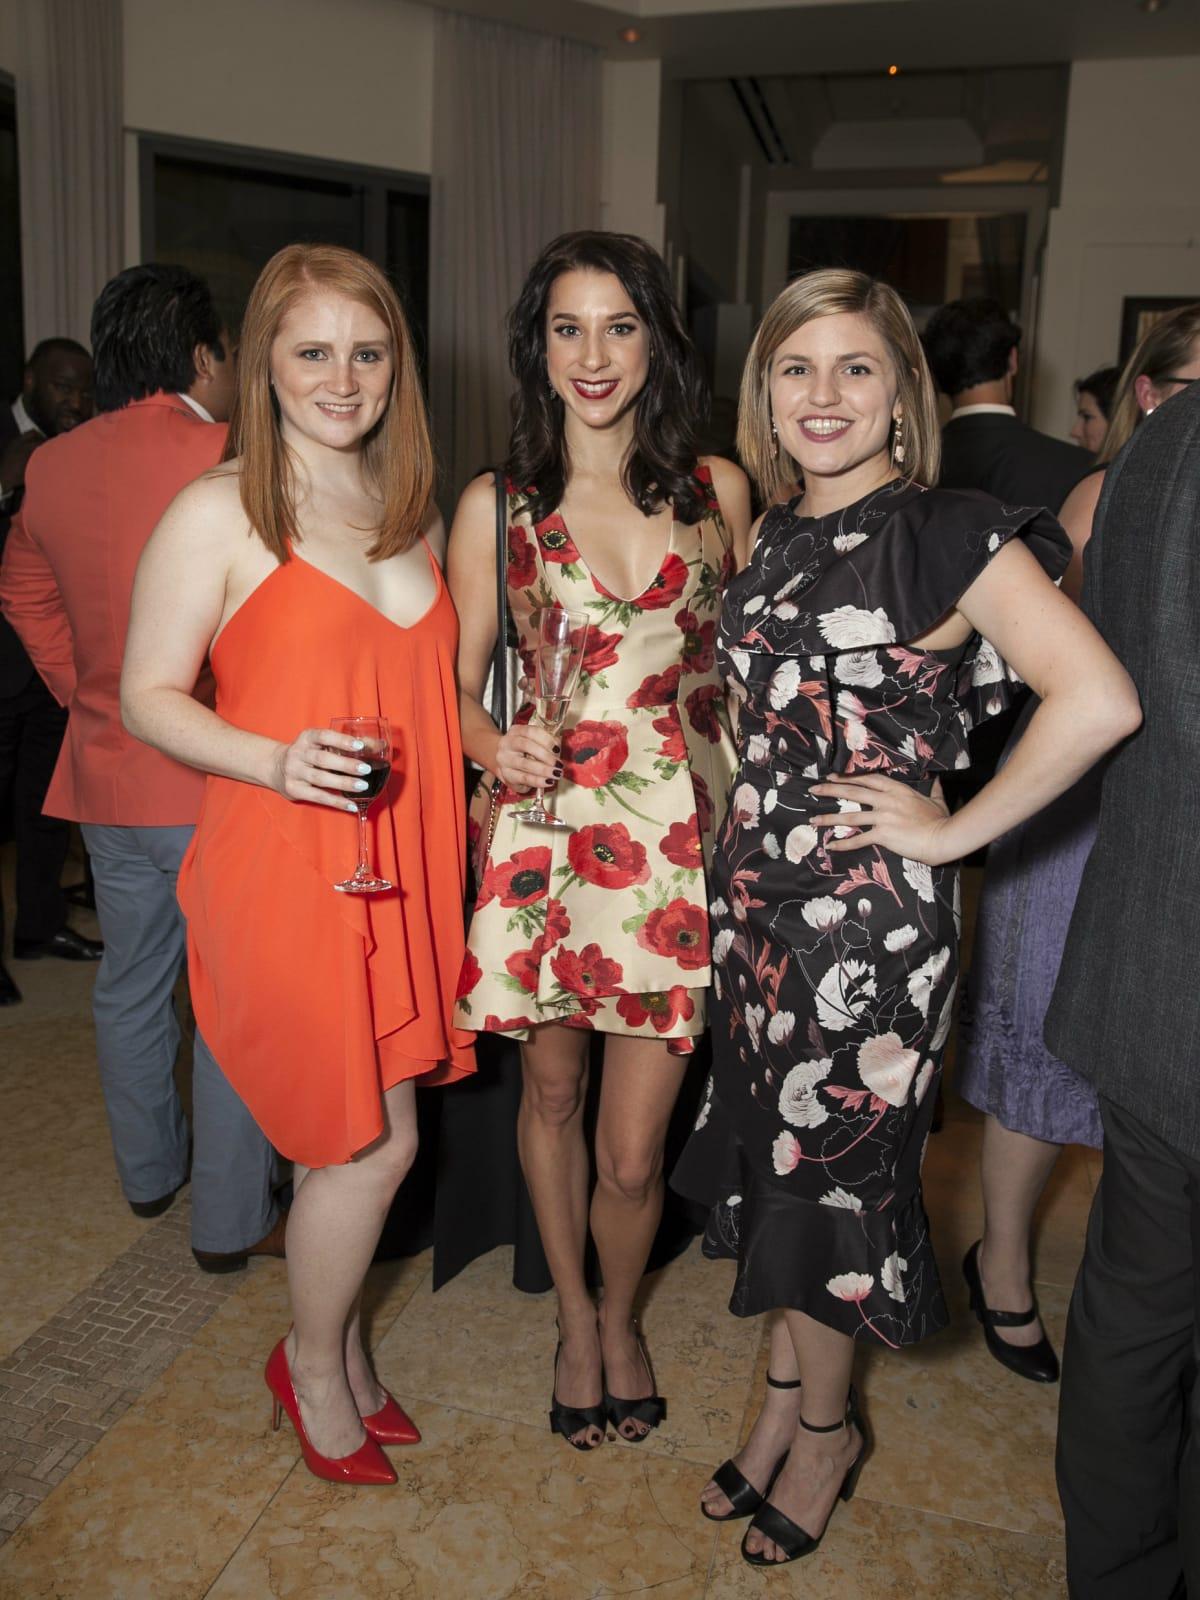 Patricia Ridenour, Erica Stuart, Olivia Utley